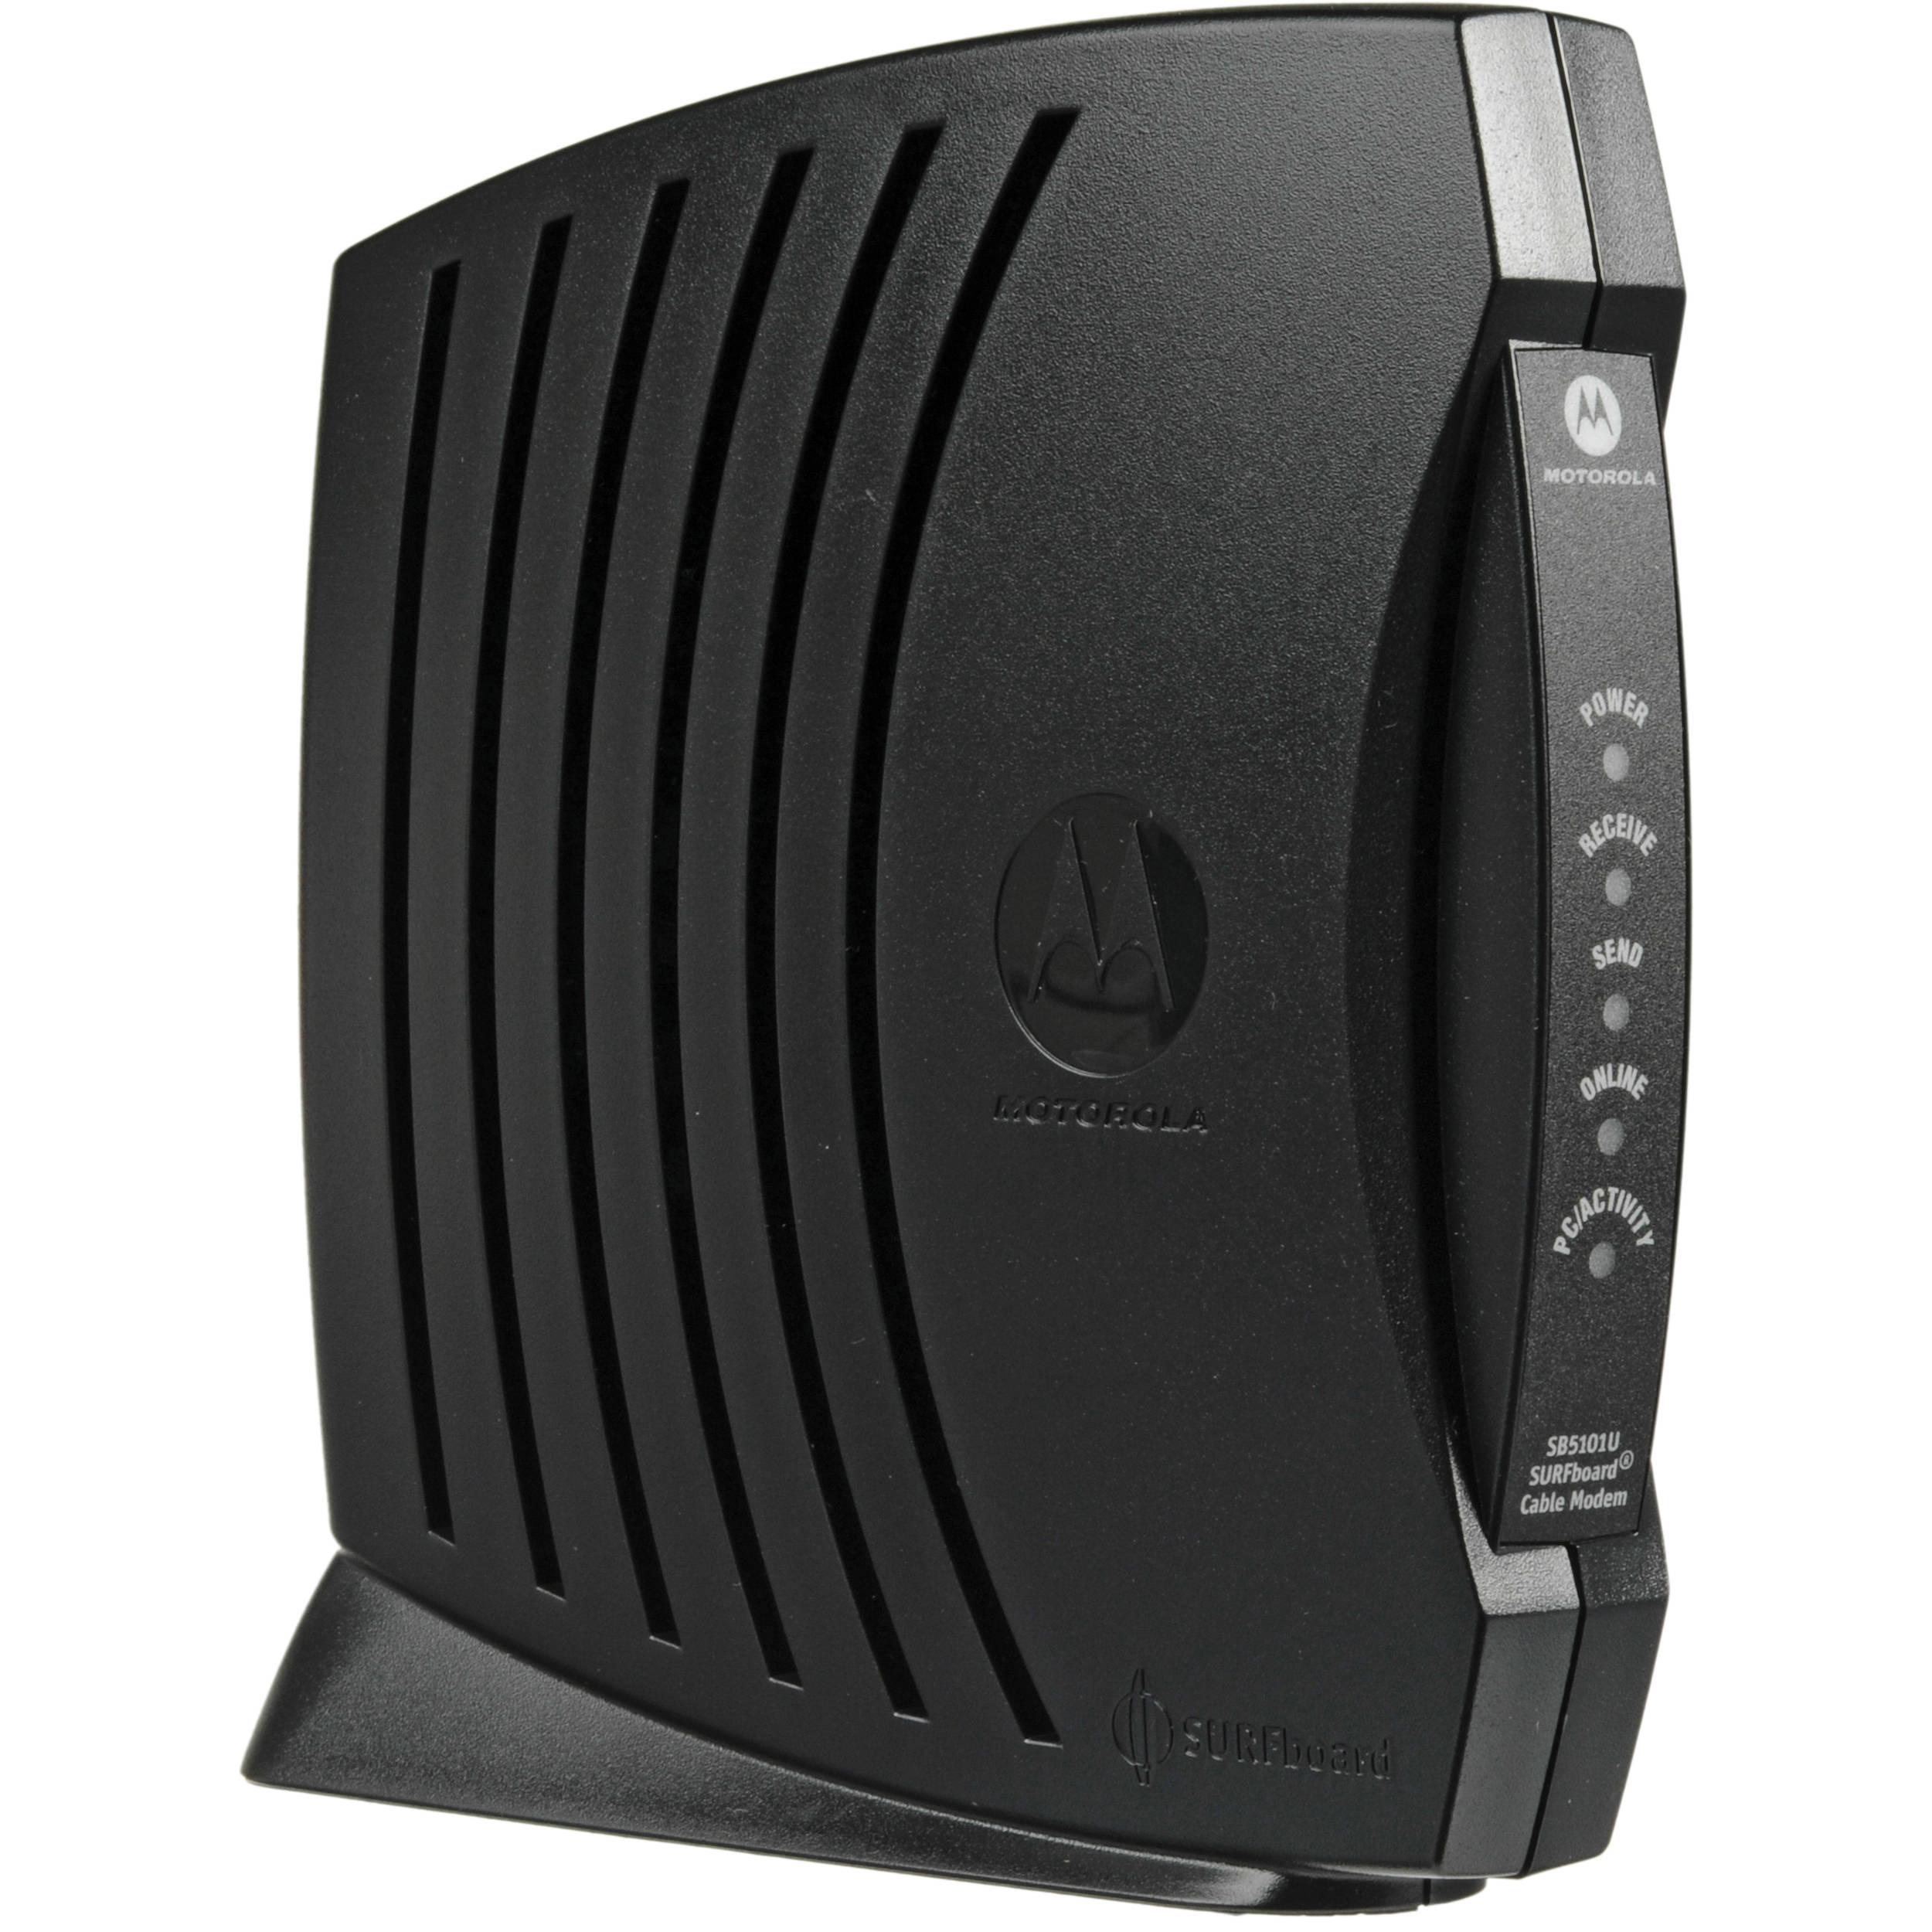 Motorola Sb5101u Surfboard Docsis 20 Retail Cable 567005 005 00